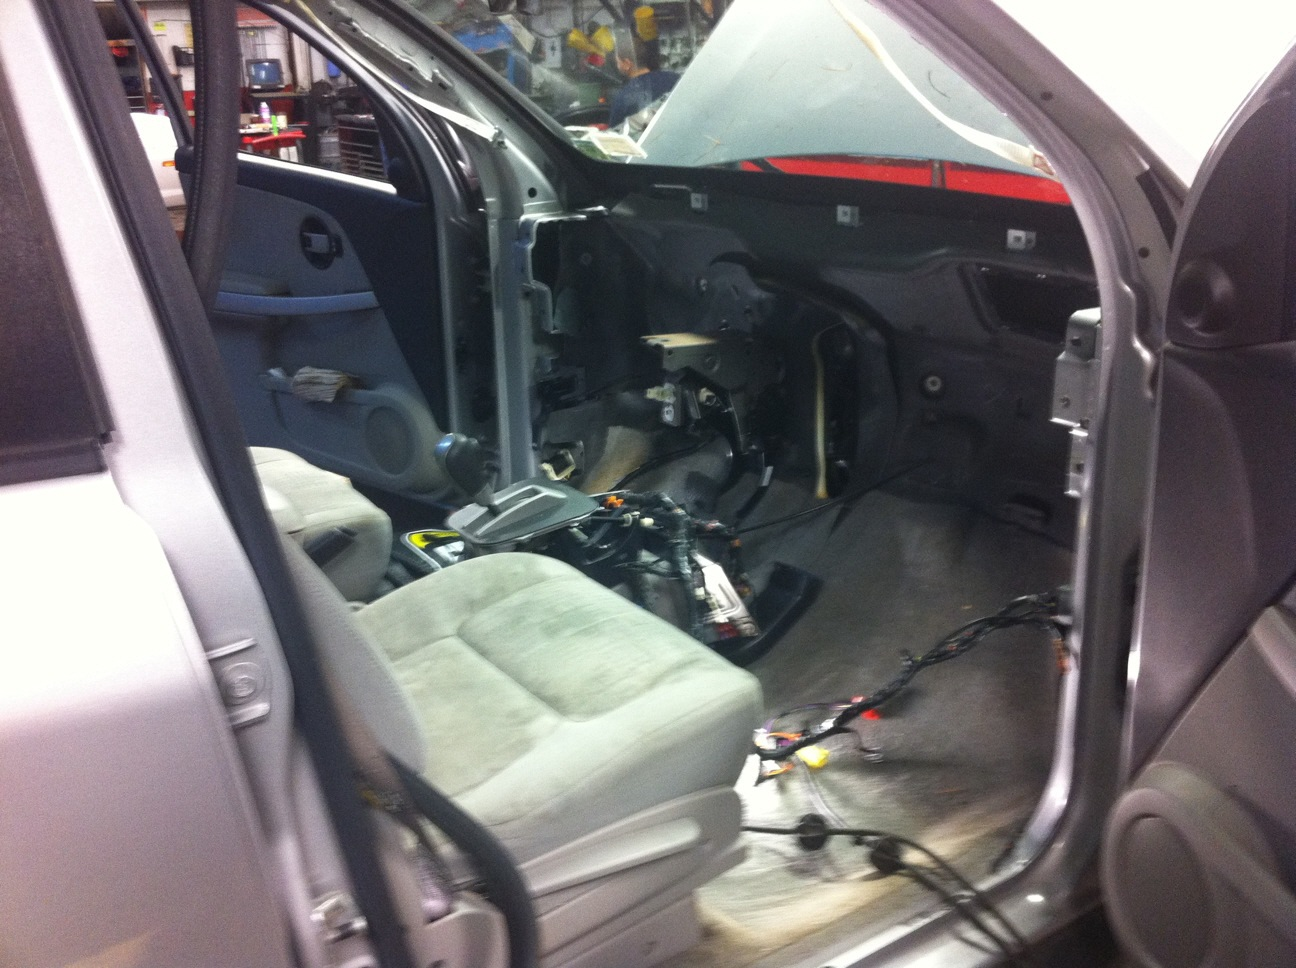 2006 Chevrolet Equinox Blend Door Repair Random Photos